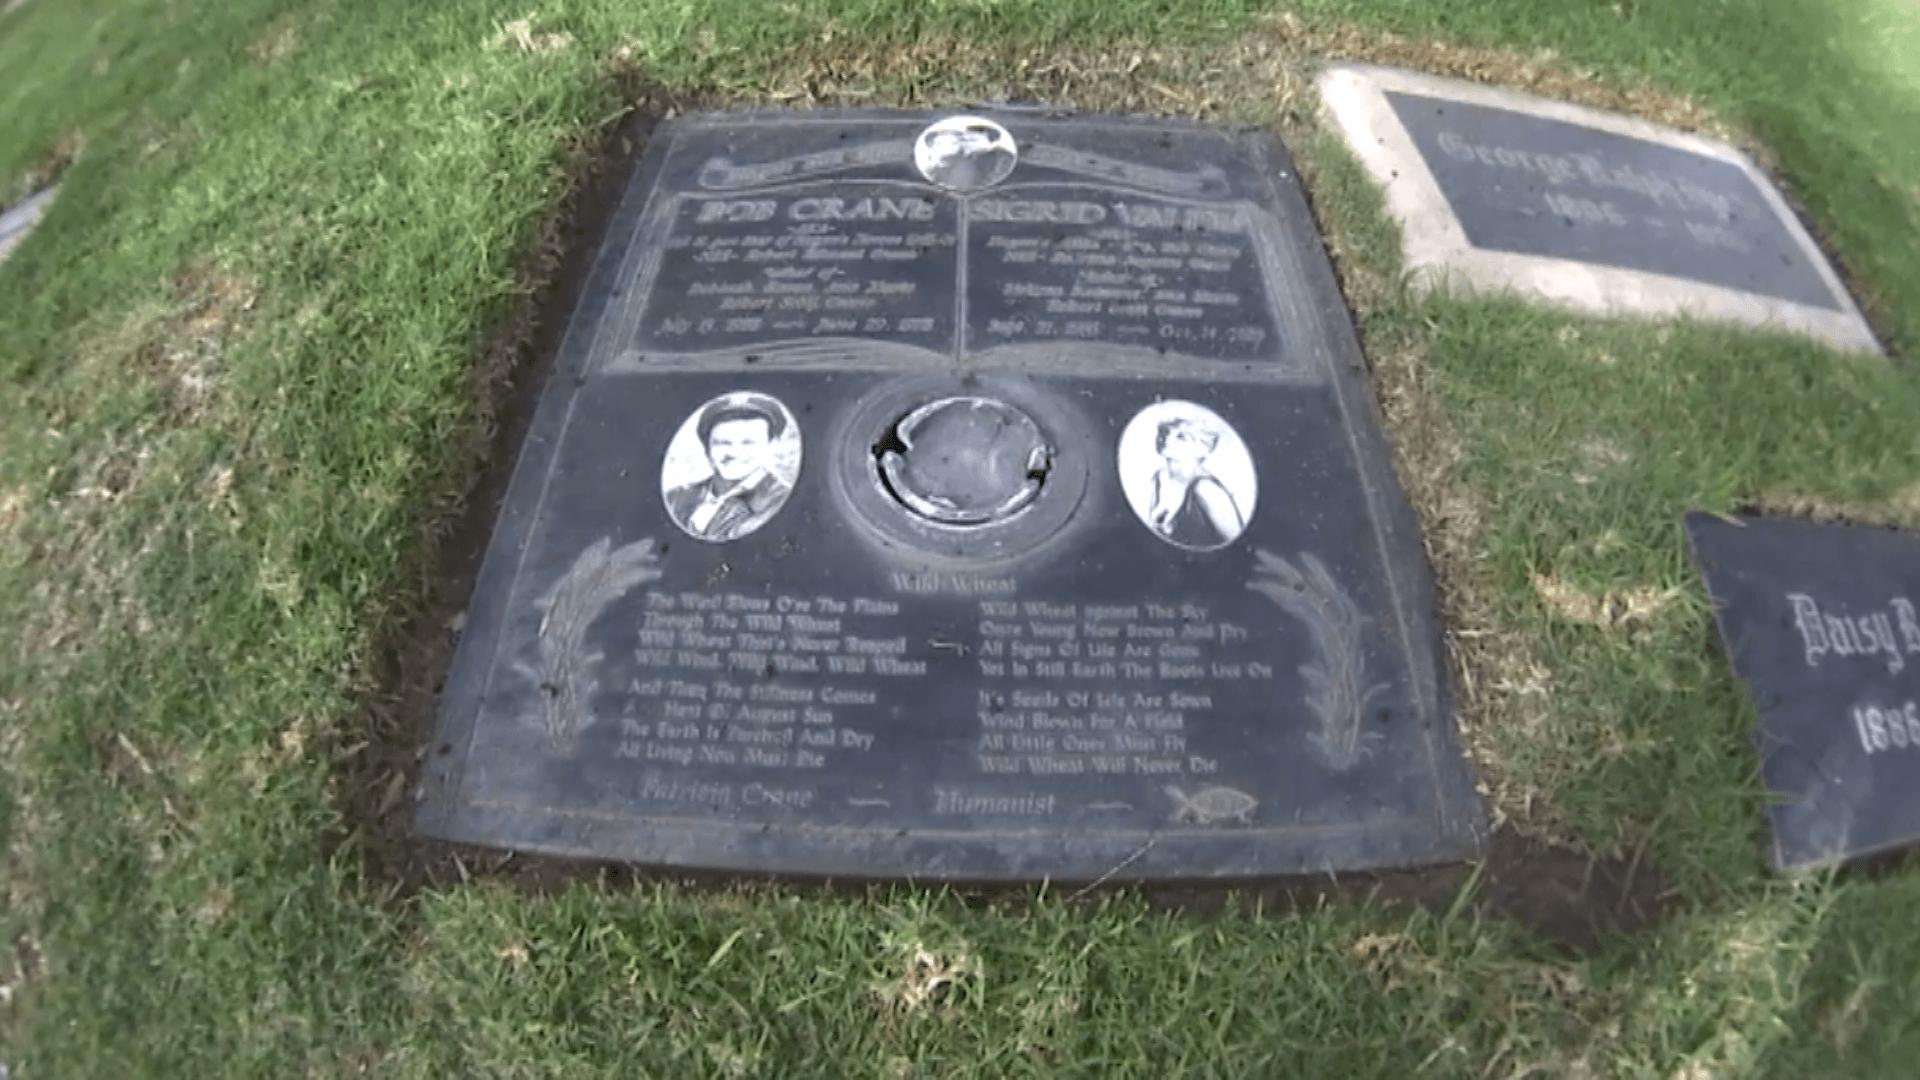 Bob Crane and his second wife's grave stone.